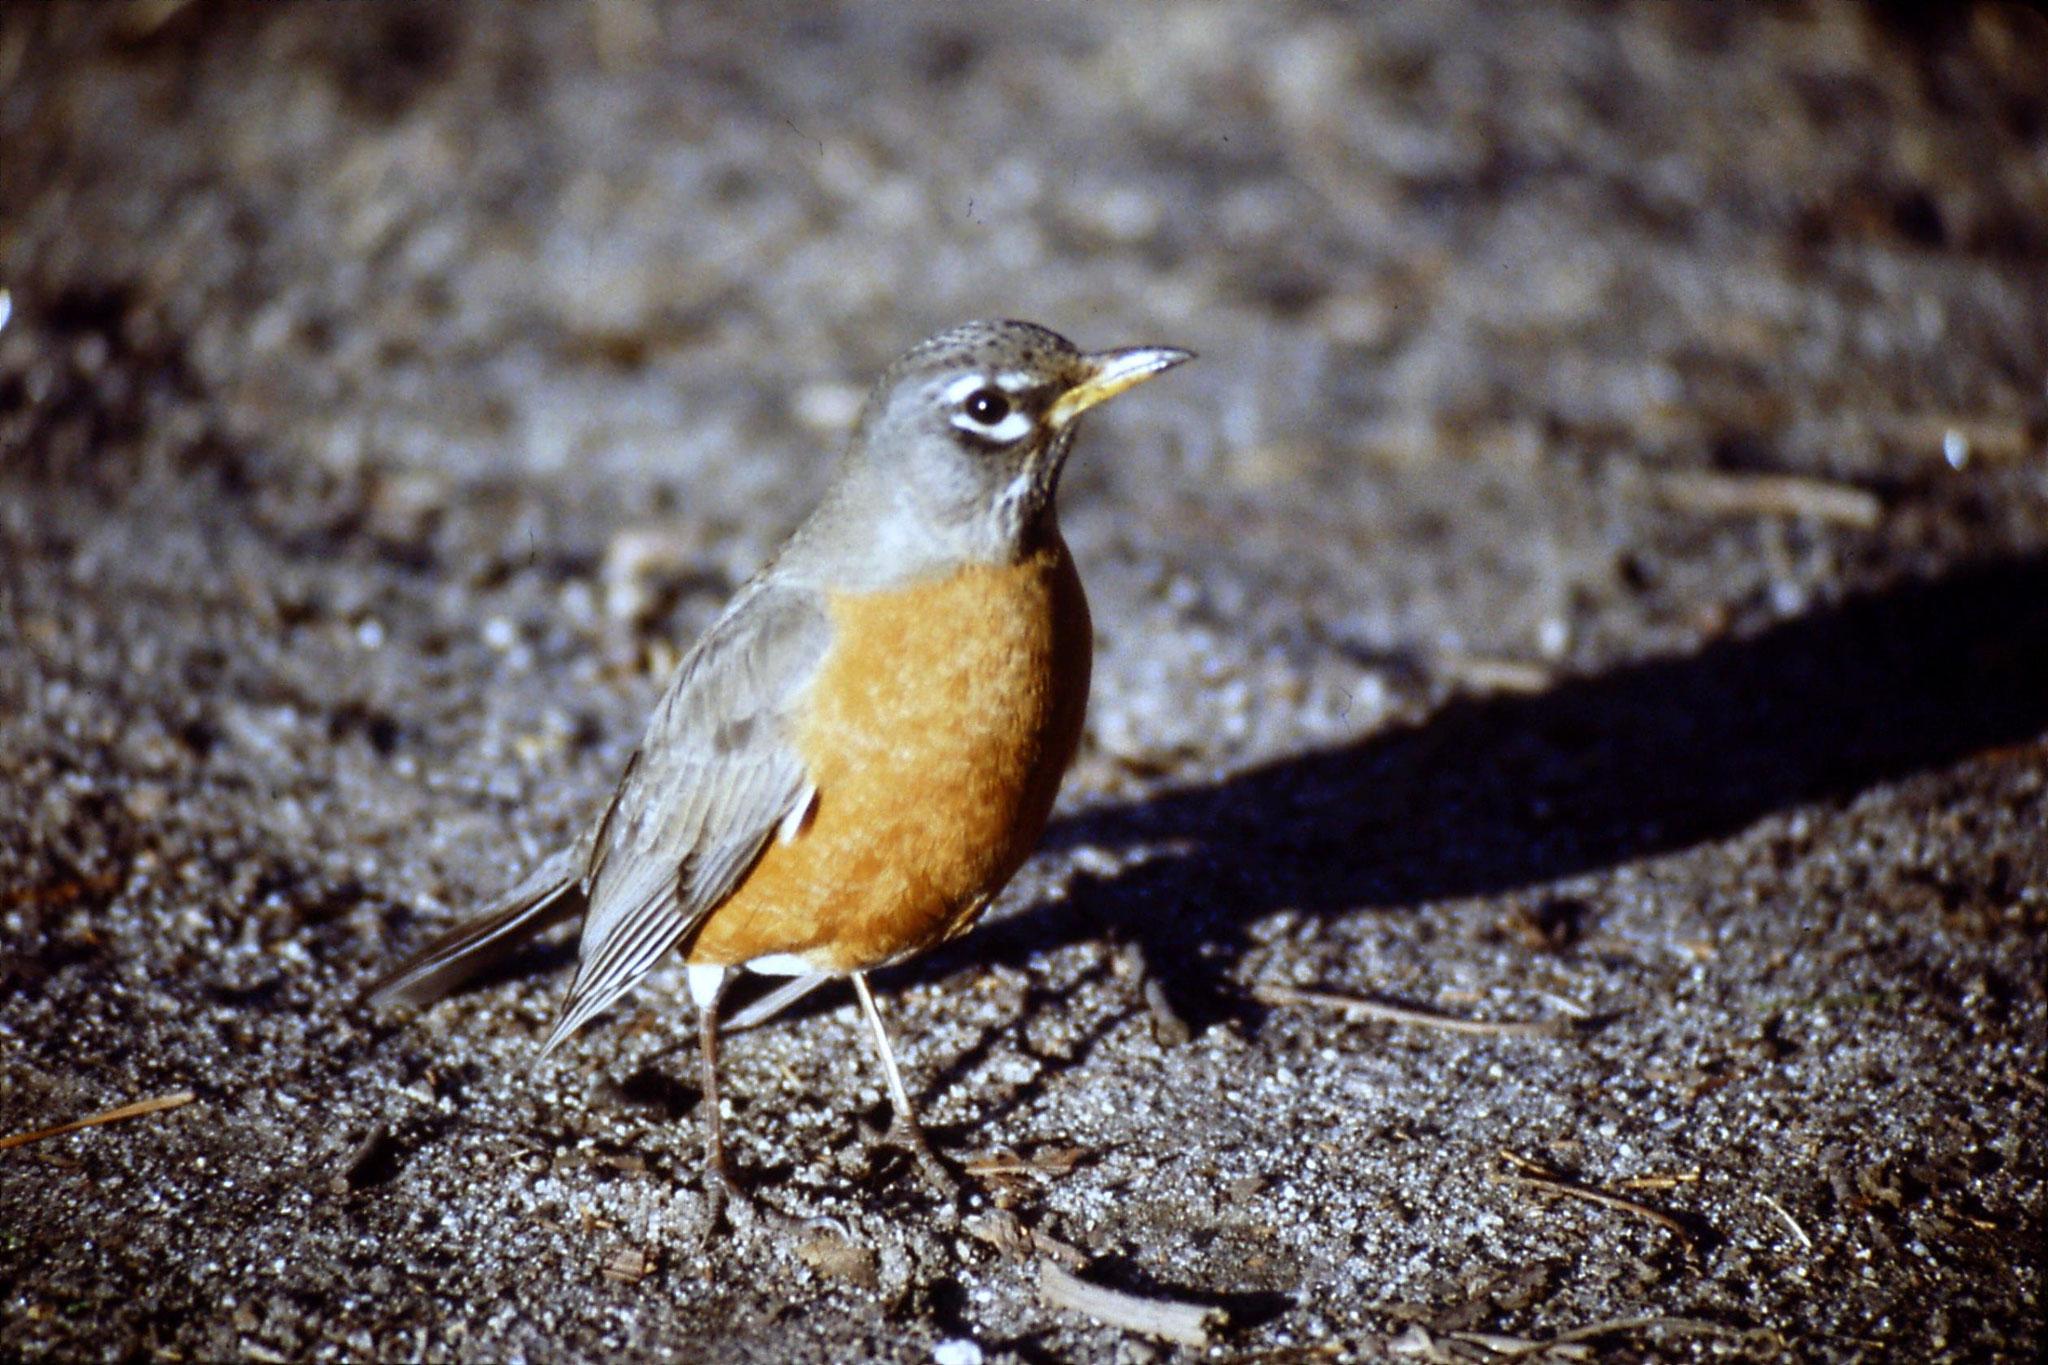 16/2/1991: 28: Yosemite, American Robin